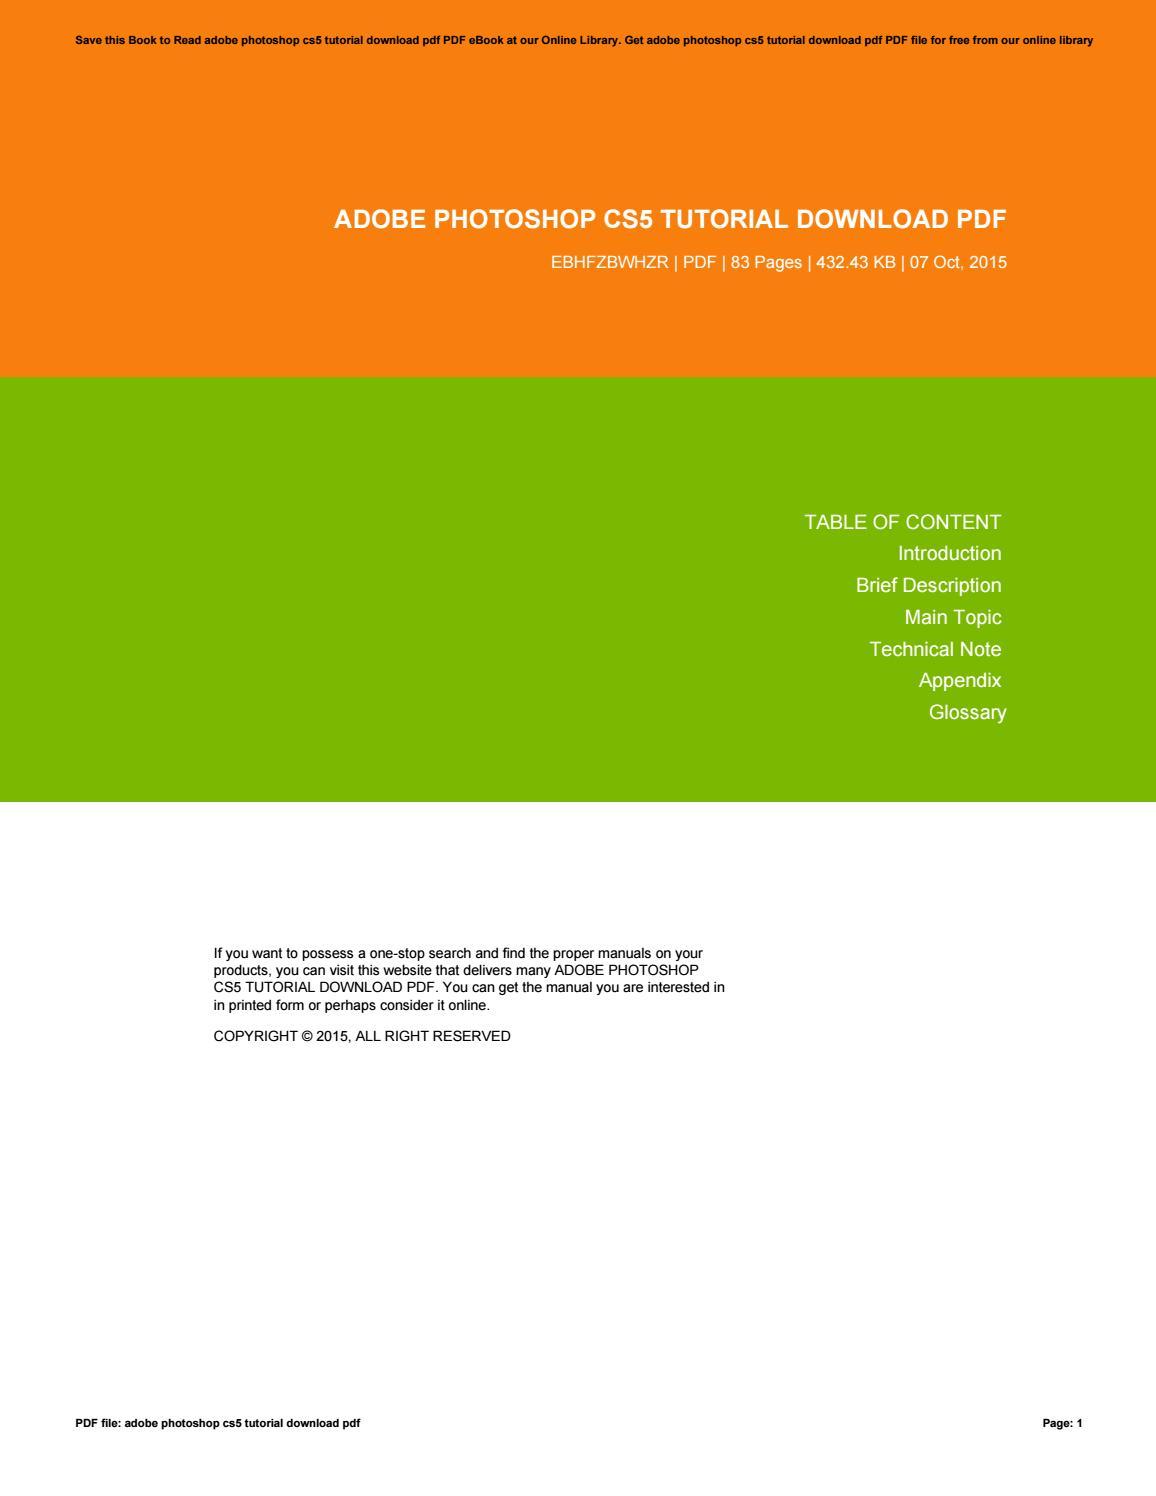 Adobe photoshop cs5 tutorial download pdf by louislawson2001 issuu baditri Image collections